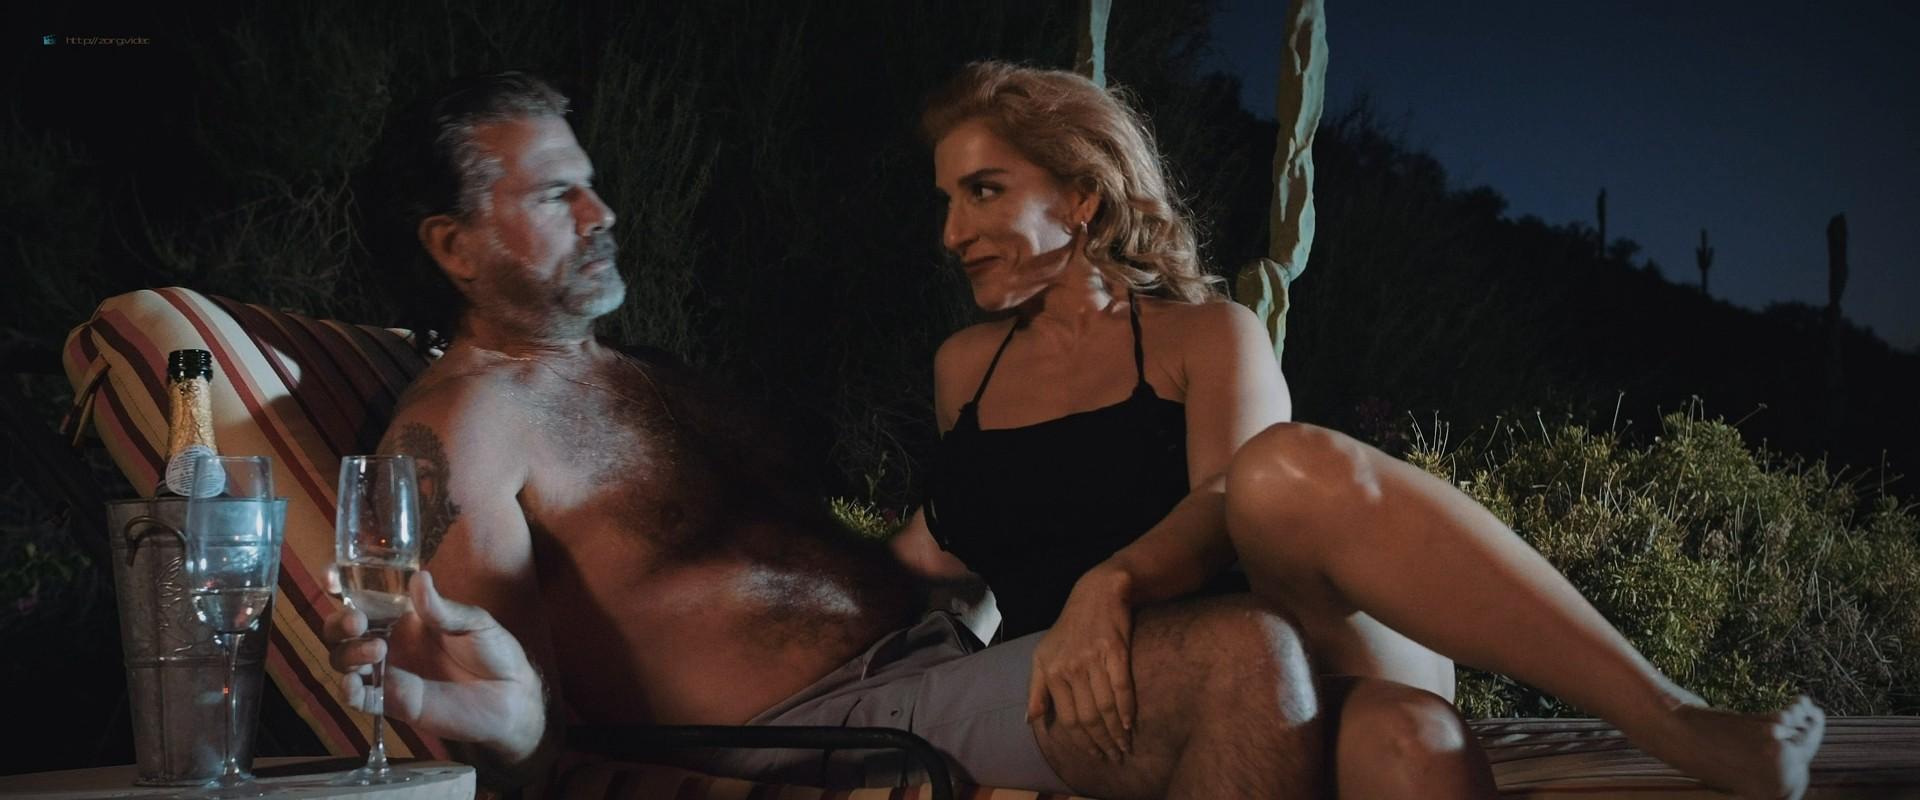 Audrey Beth nude topless Kier Simonetta, Michelle Miller nude too - Water (2019) 1080p (12)